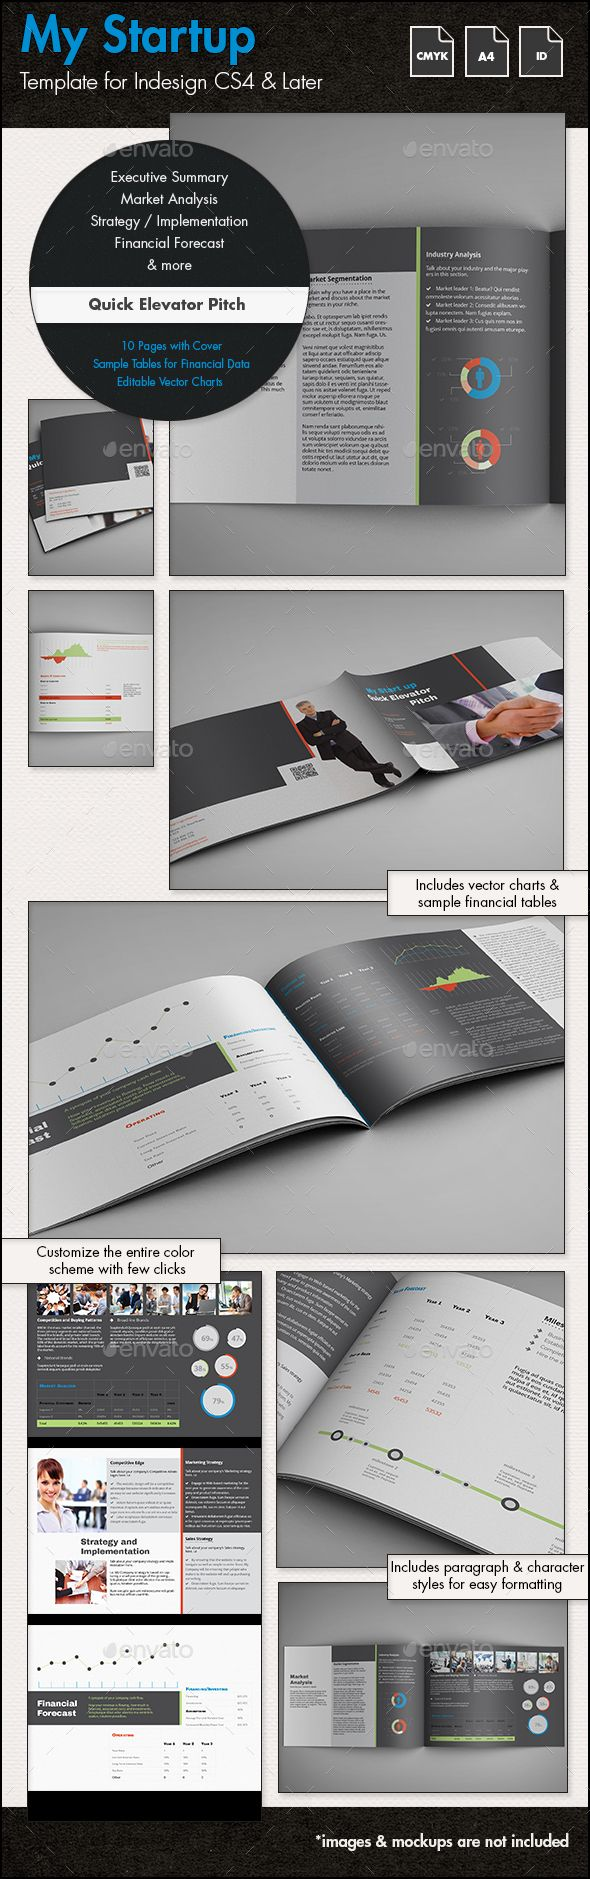 Quick Business Plan Template / Elevator Pitch - A4 Landscape